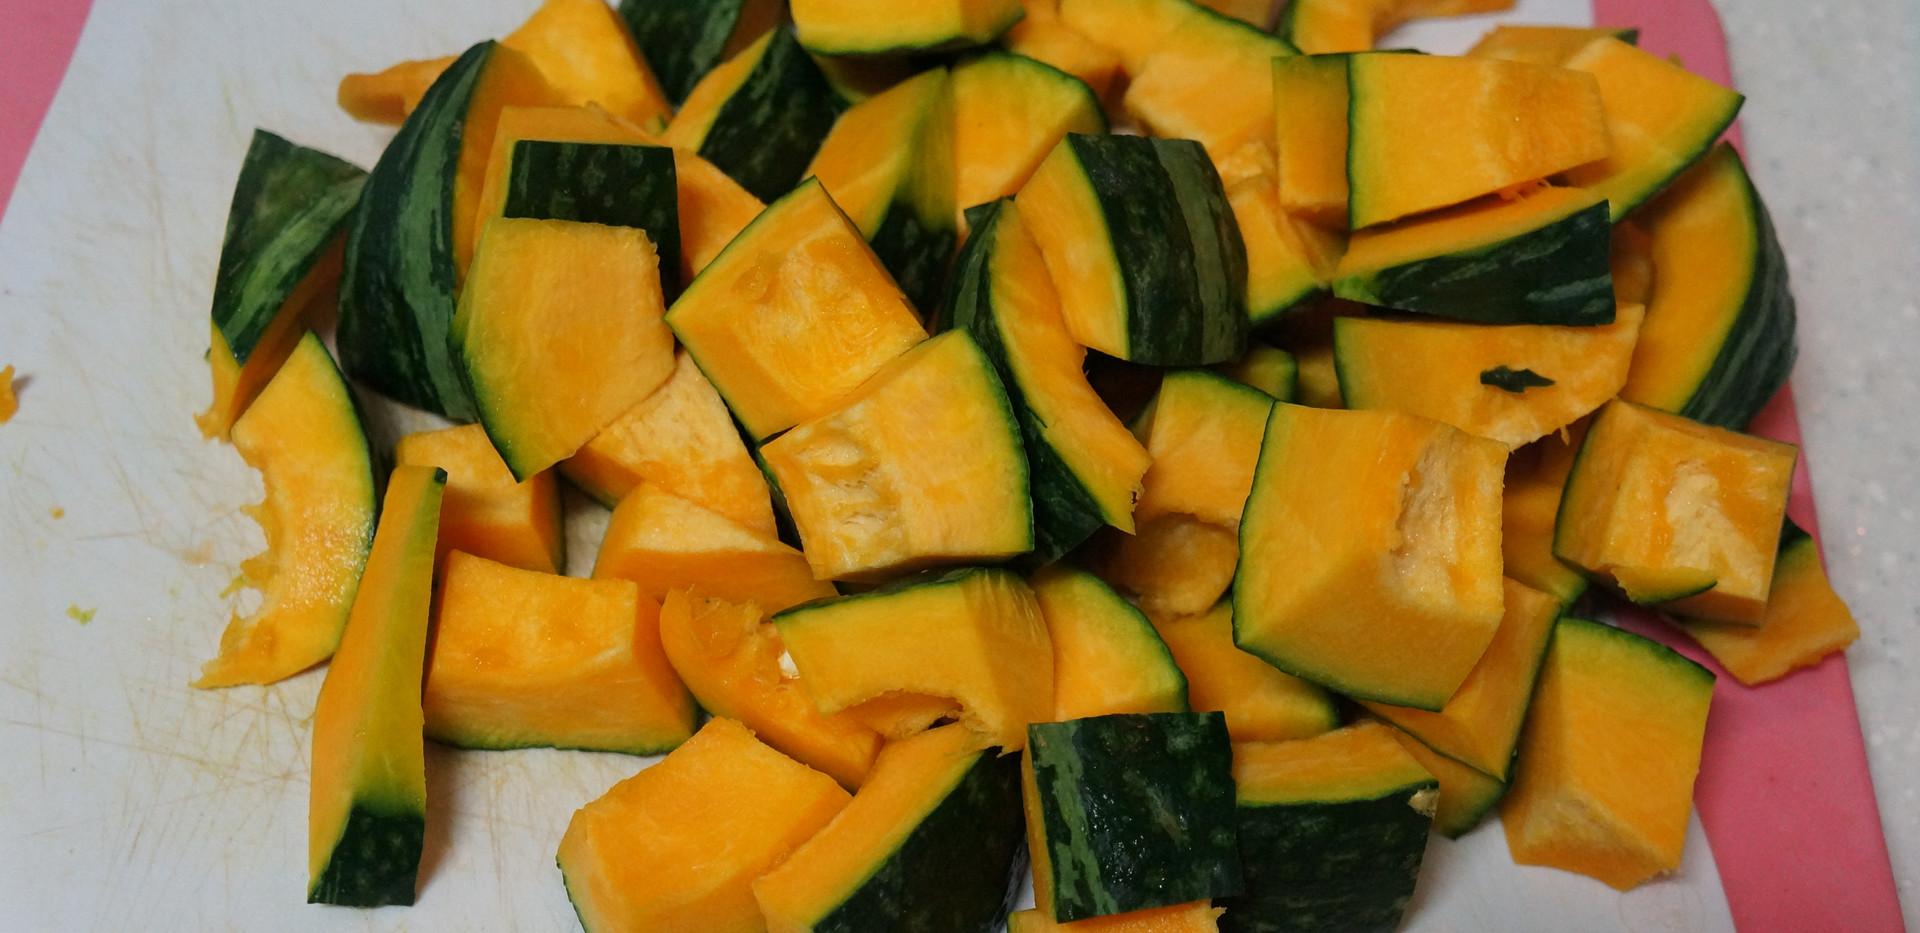 Kabocha Pumpkin (winter squash)